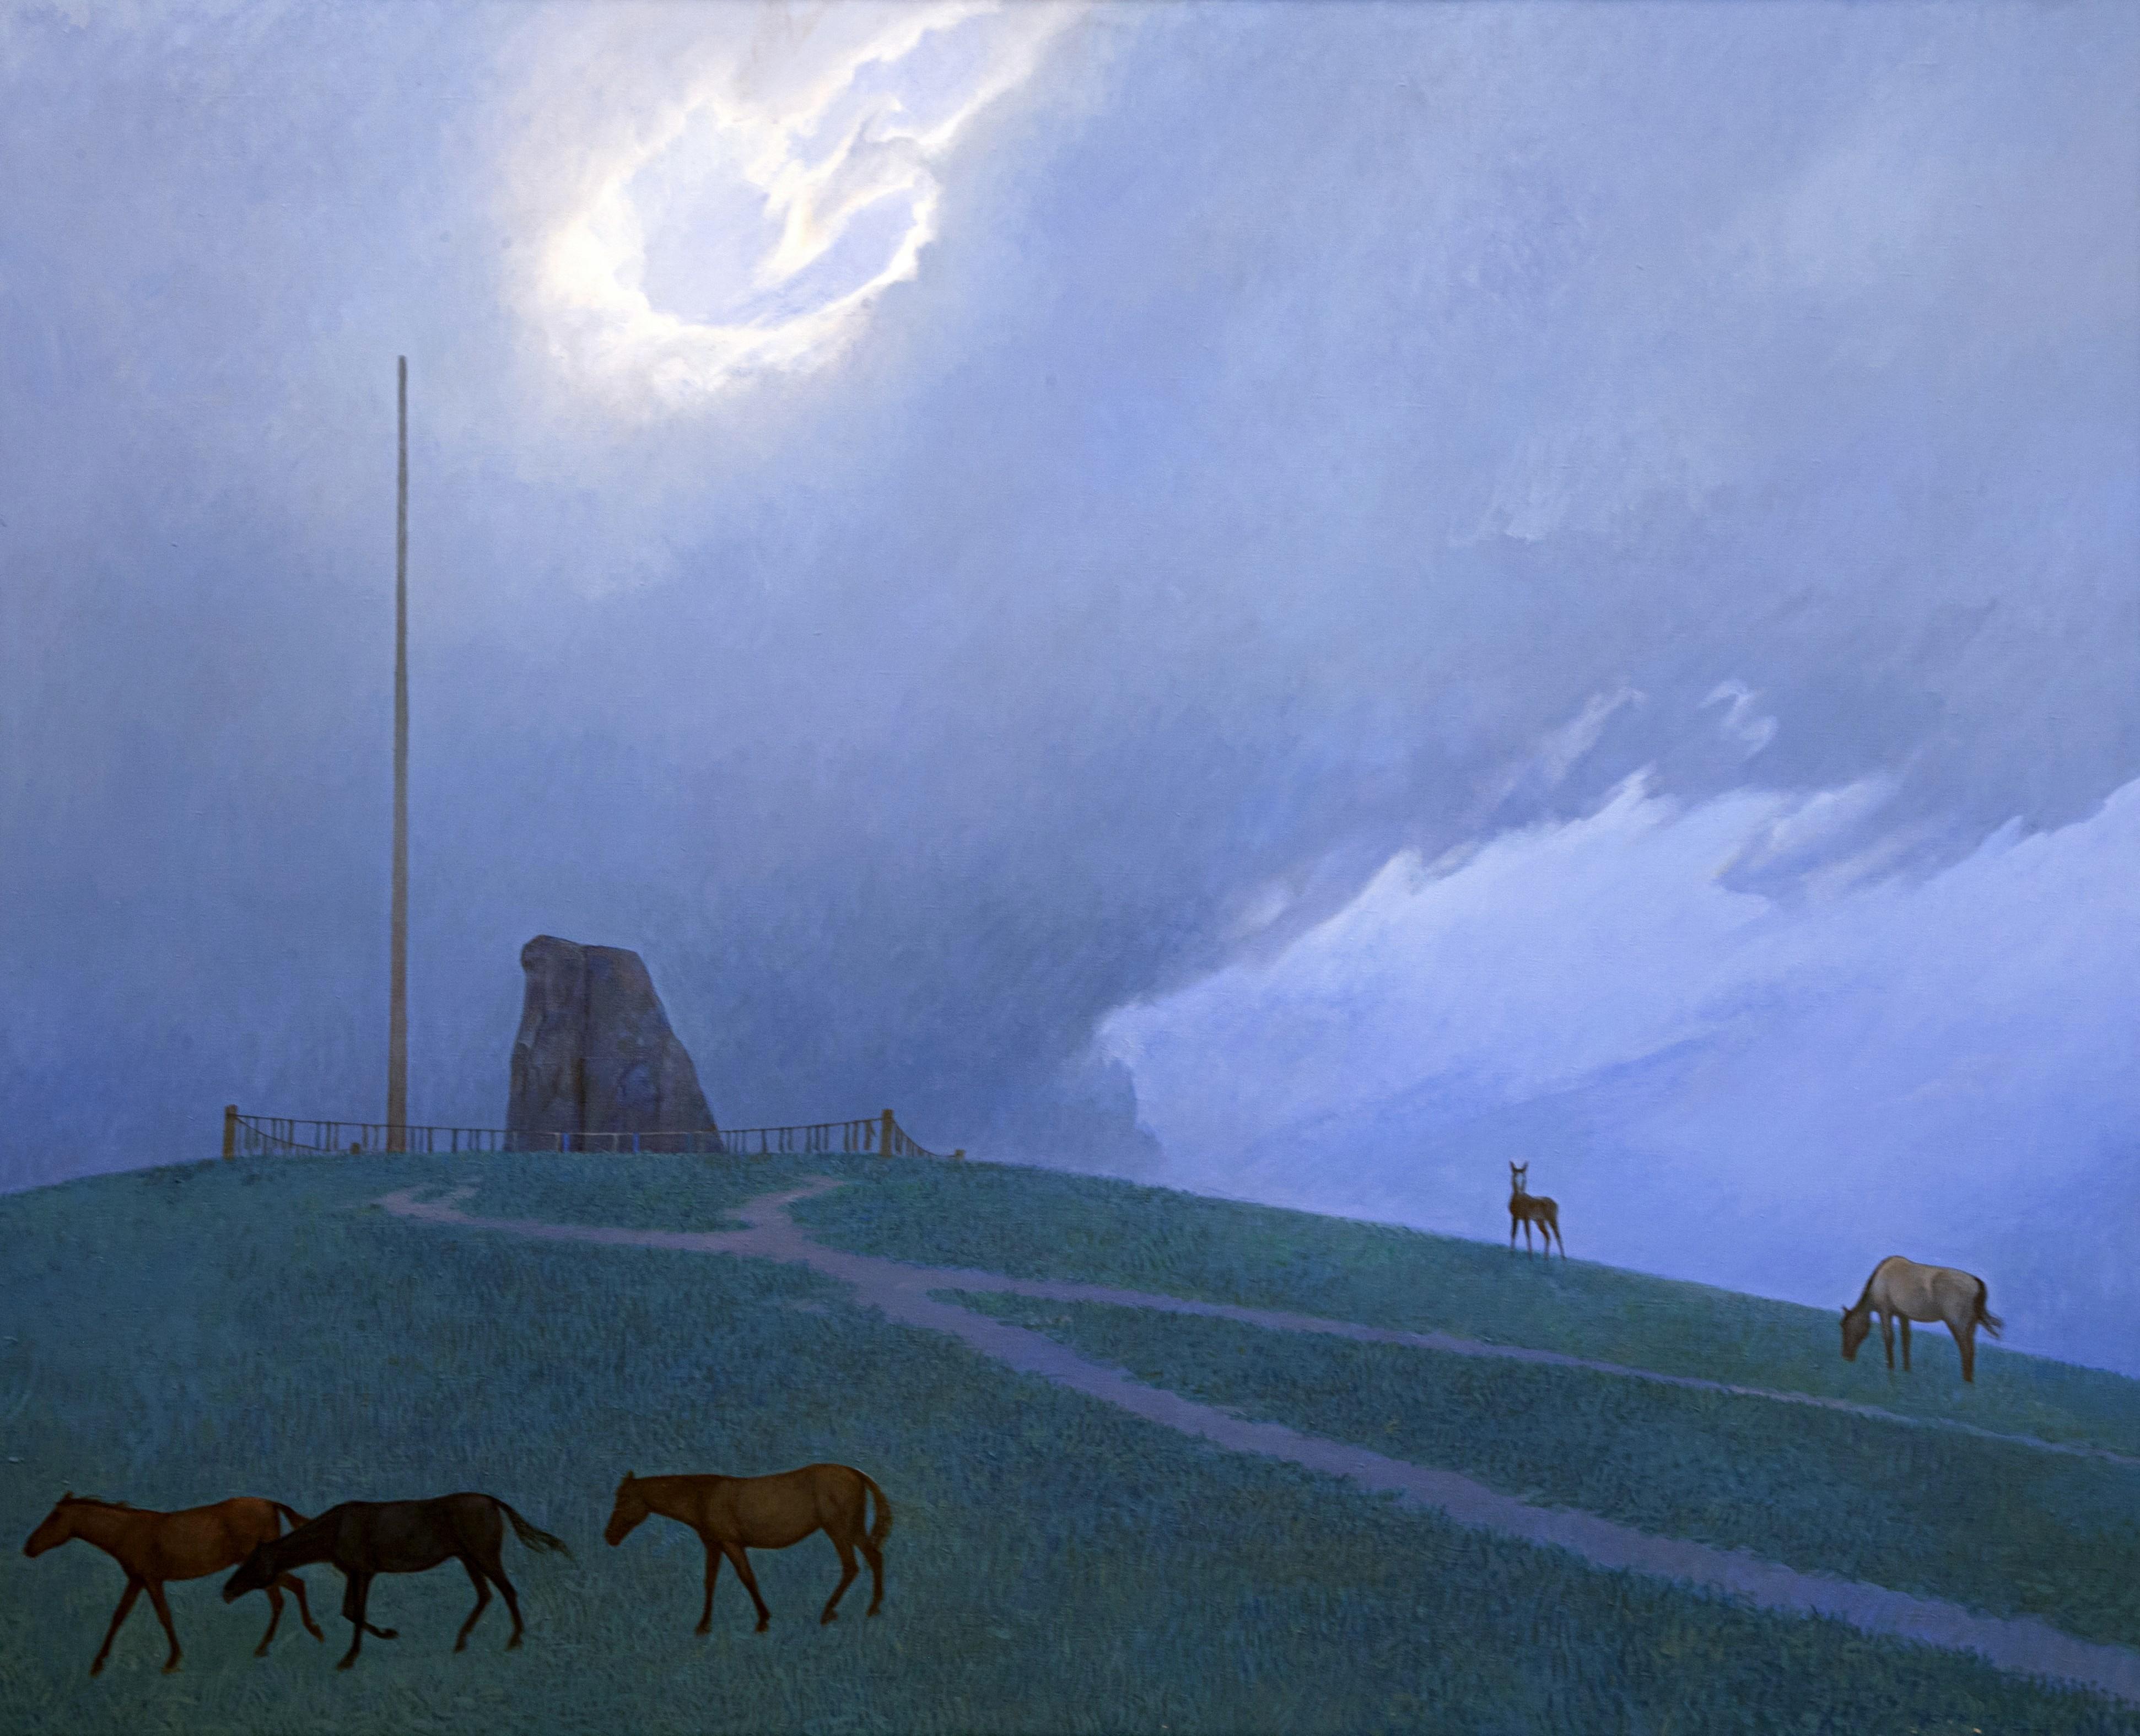 Азат Миннекаев. Коновязь небесного коня. 2011. Холст, акрил. 80х100 см. Коллекция Фонда Марджани.jpg